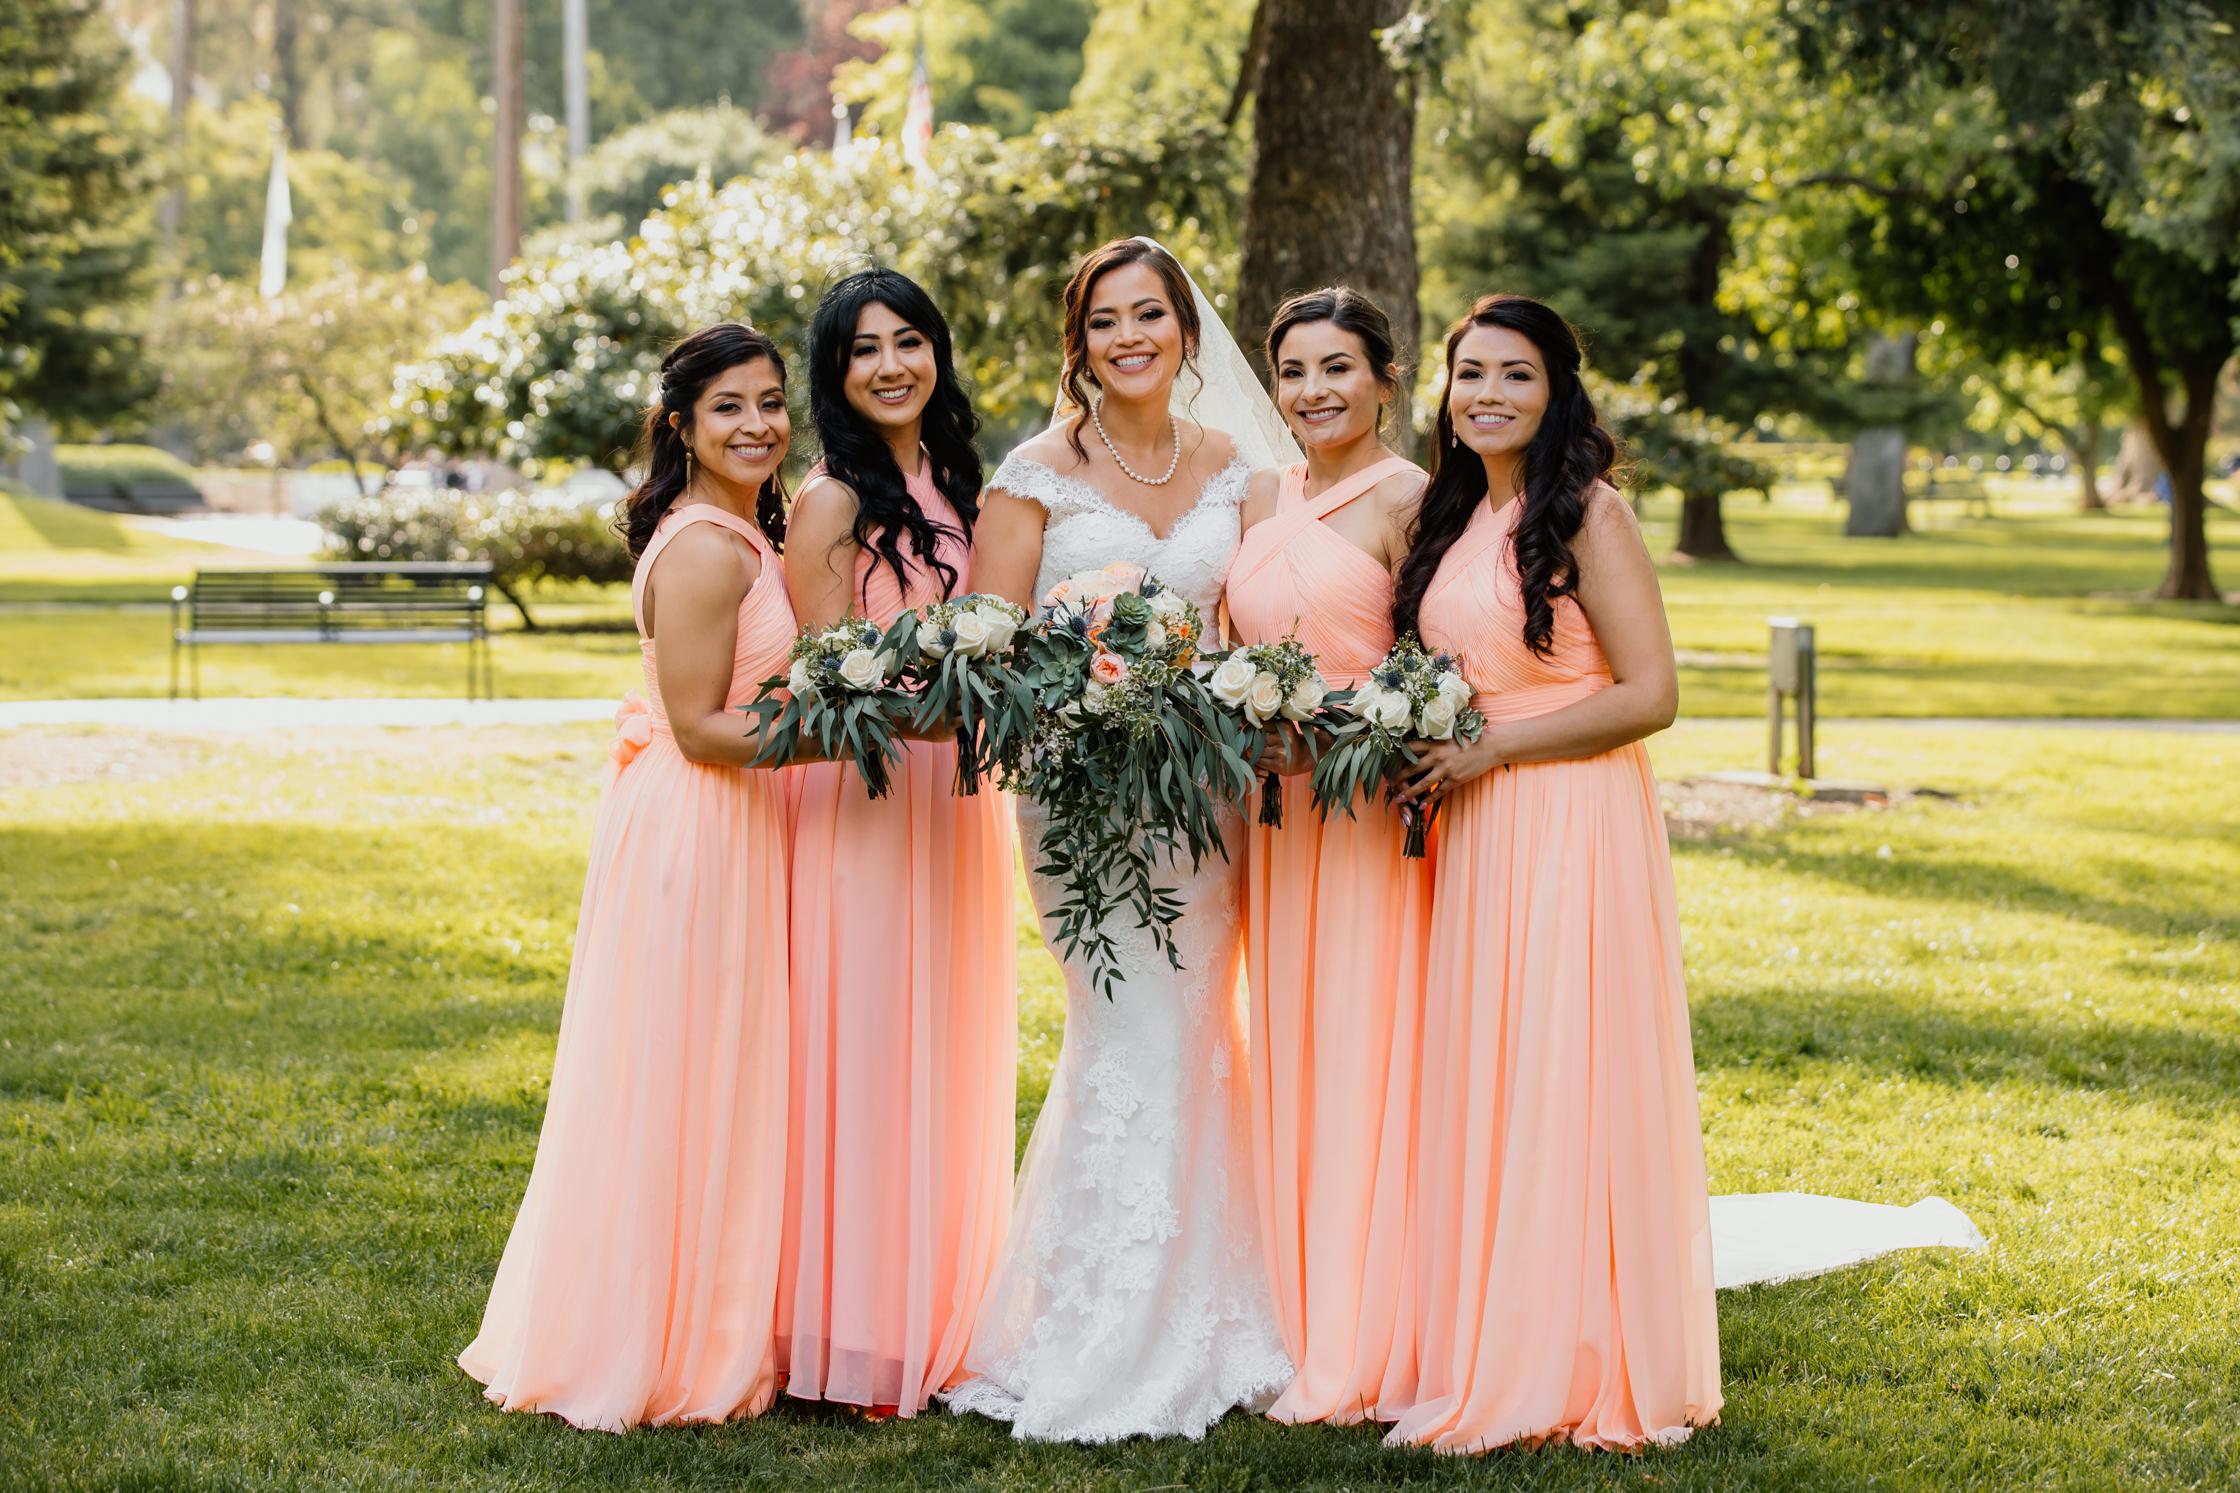 luis_joanna_wedding-58.jpg